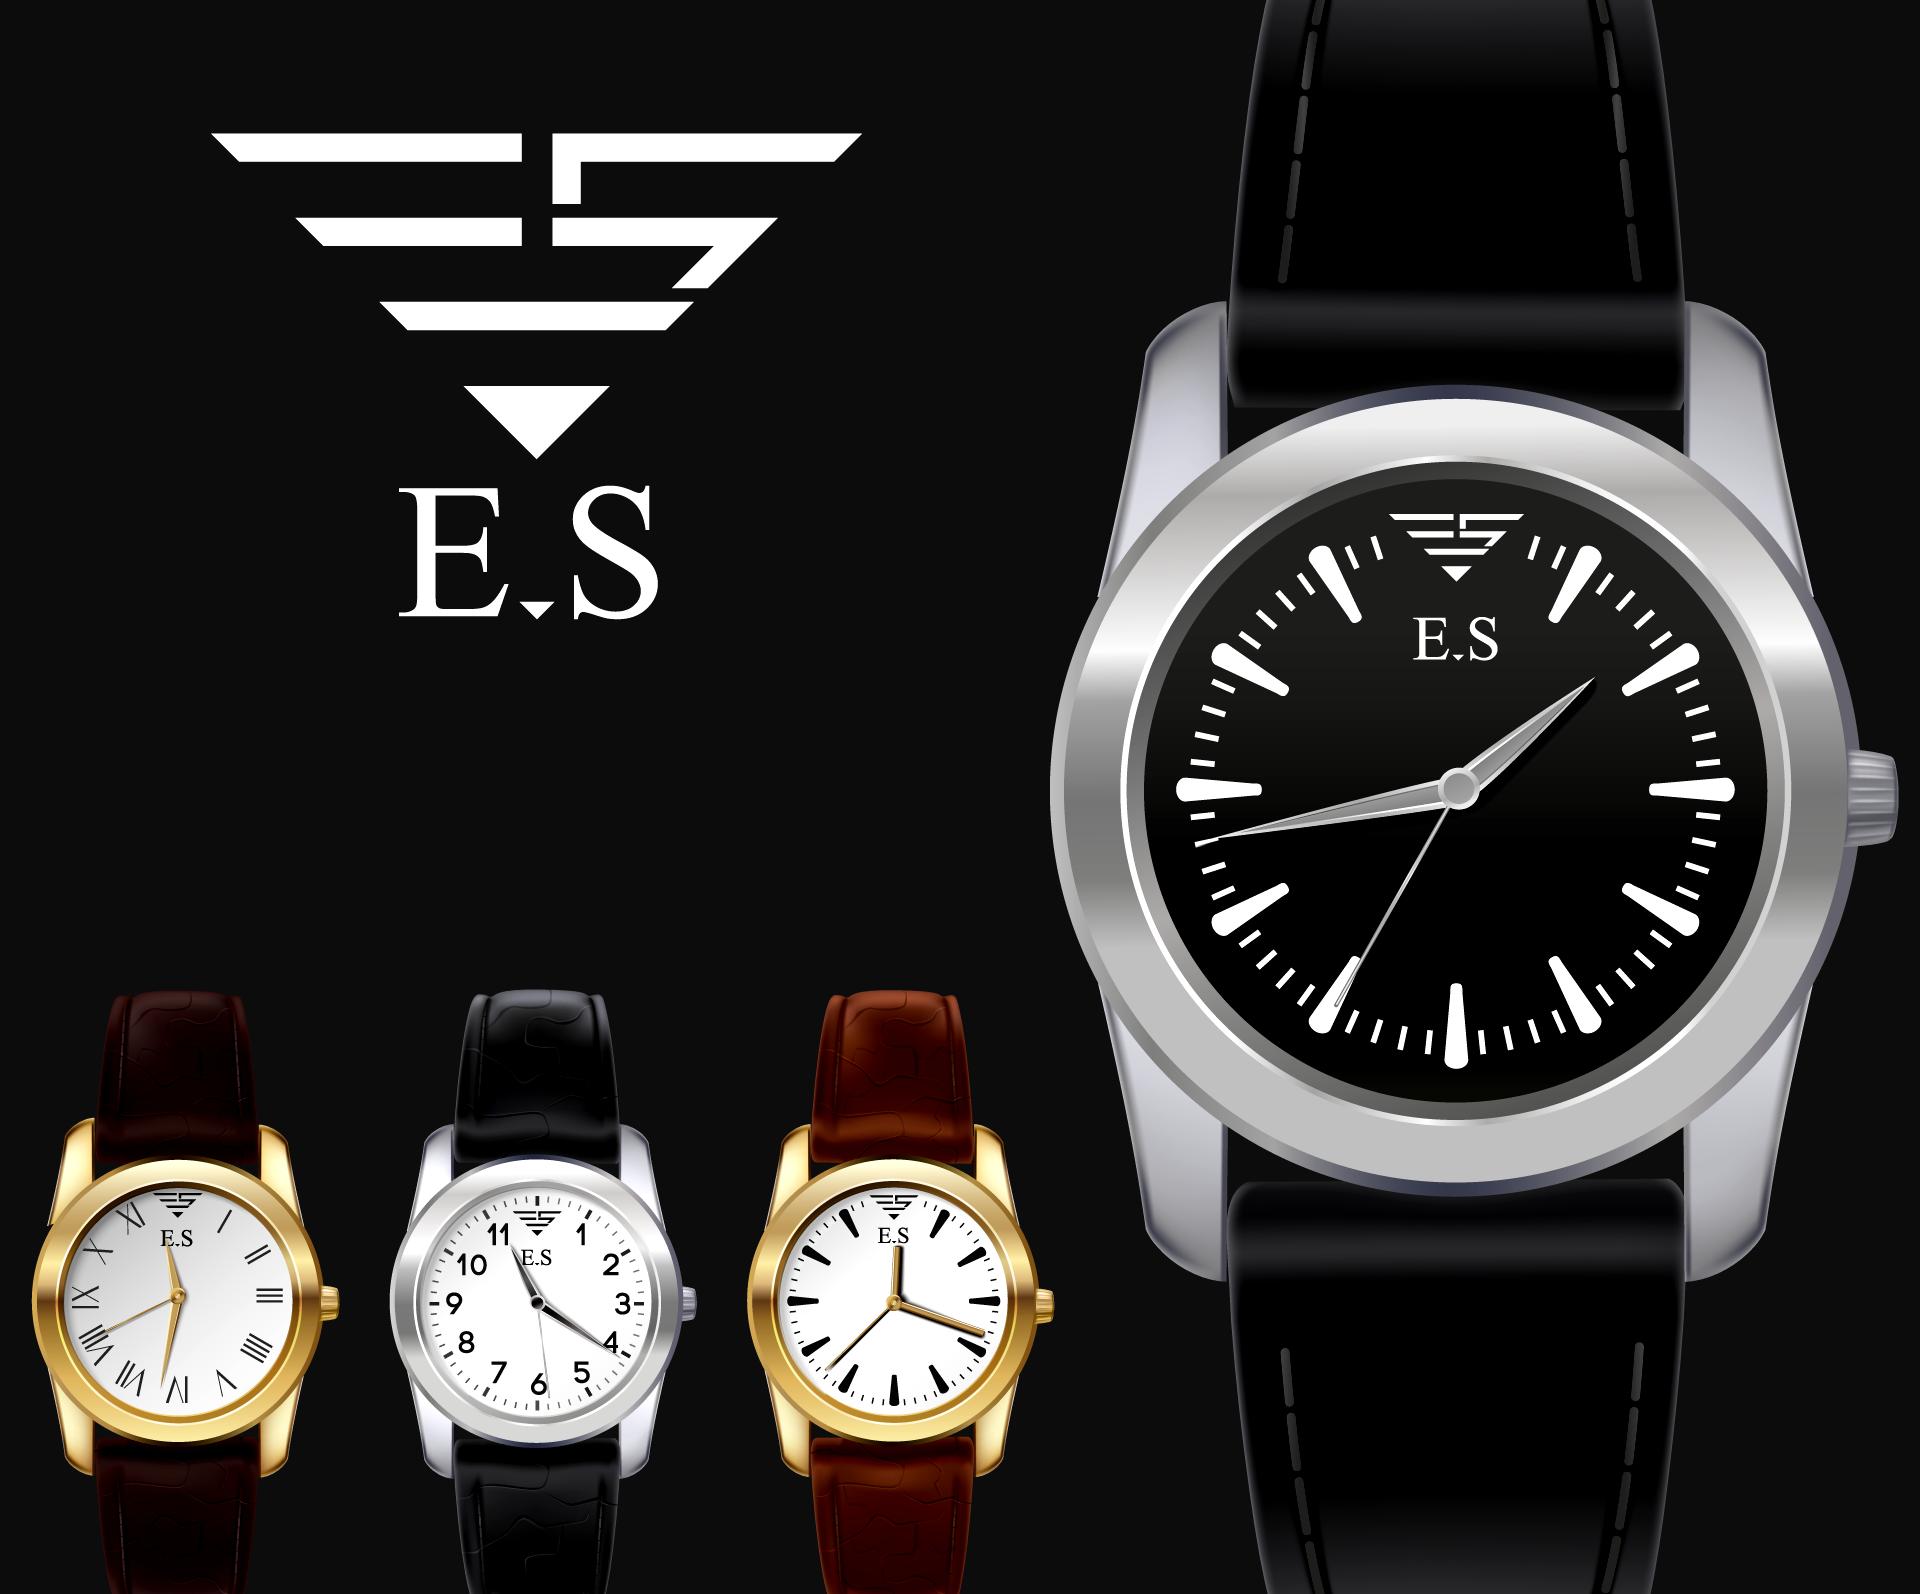 luxury watches logos - HD1920×1594